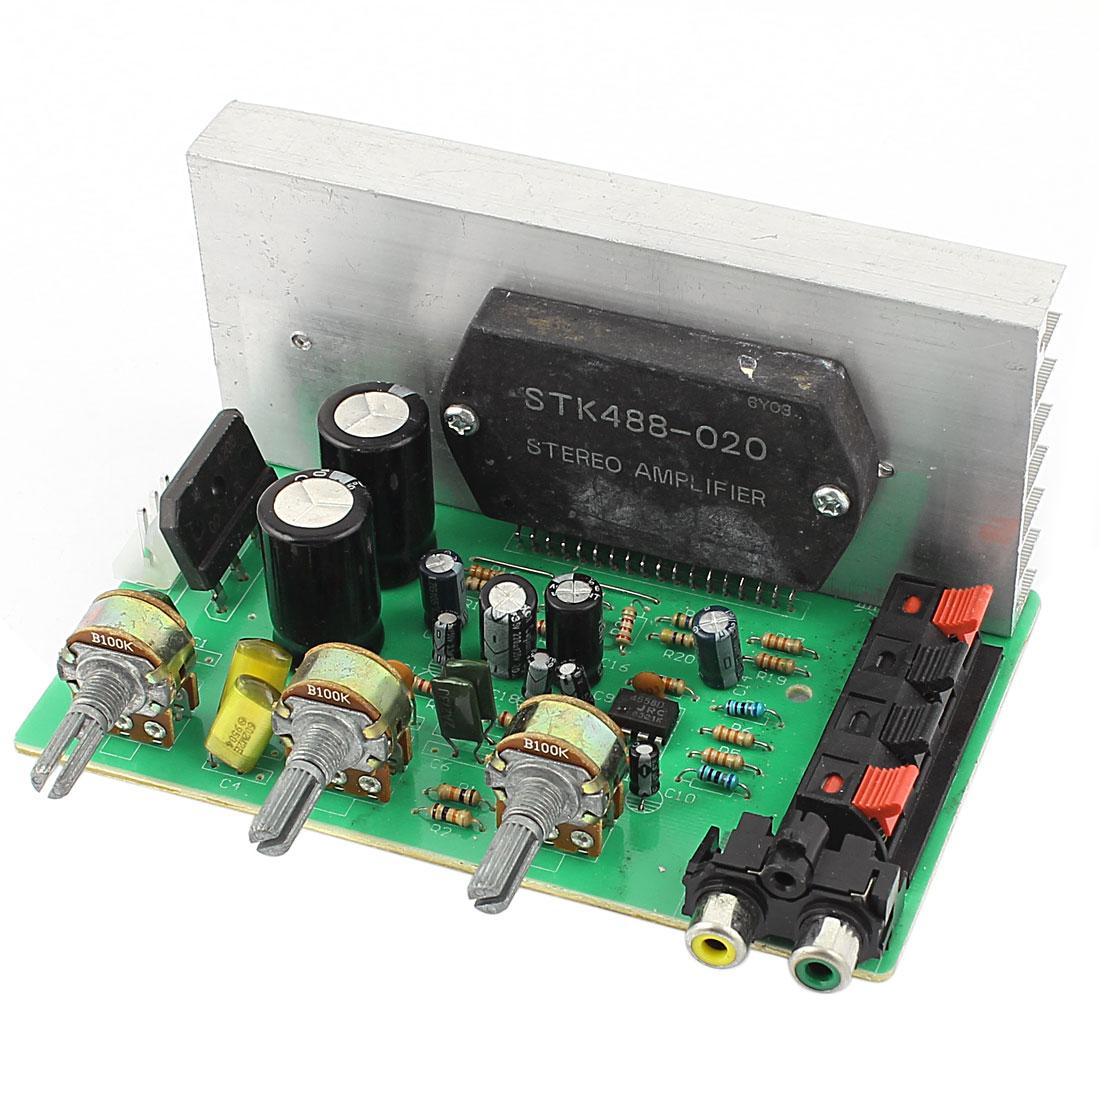 DC 15V-24V 100W LFE Hi-Fi 2 Channel Audio Stereo Power Amplifier Board AM0408 for Car